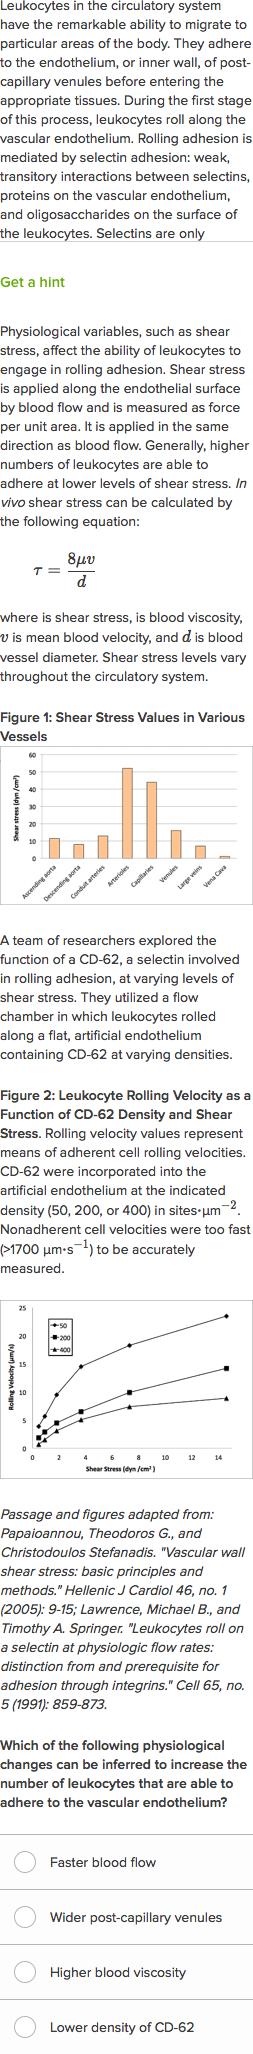 Leukocytes Roll On Blood Vessel Walls Practice Khan Academy